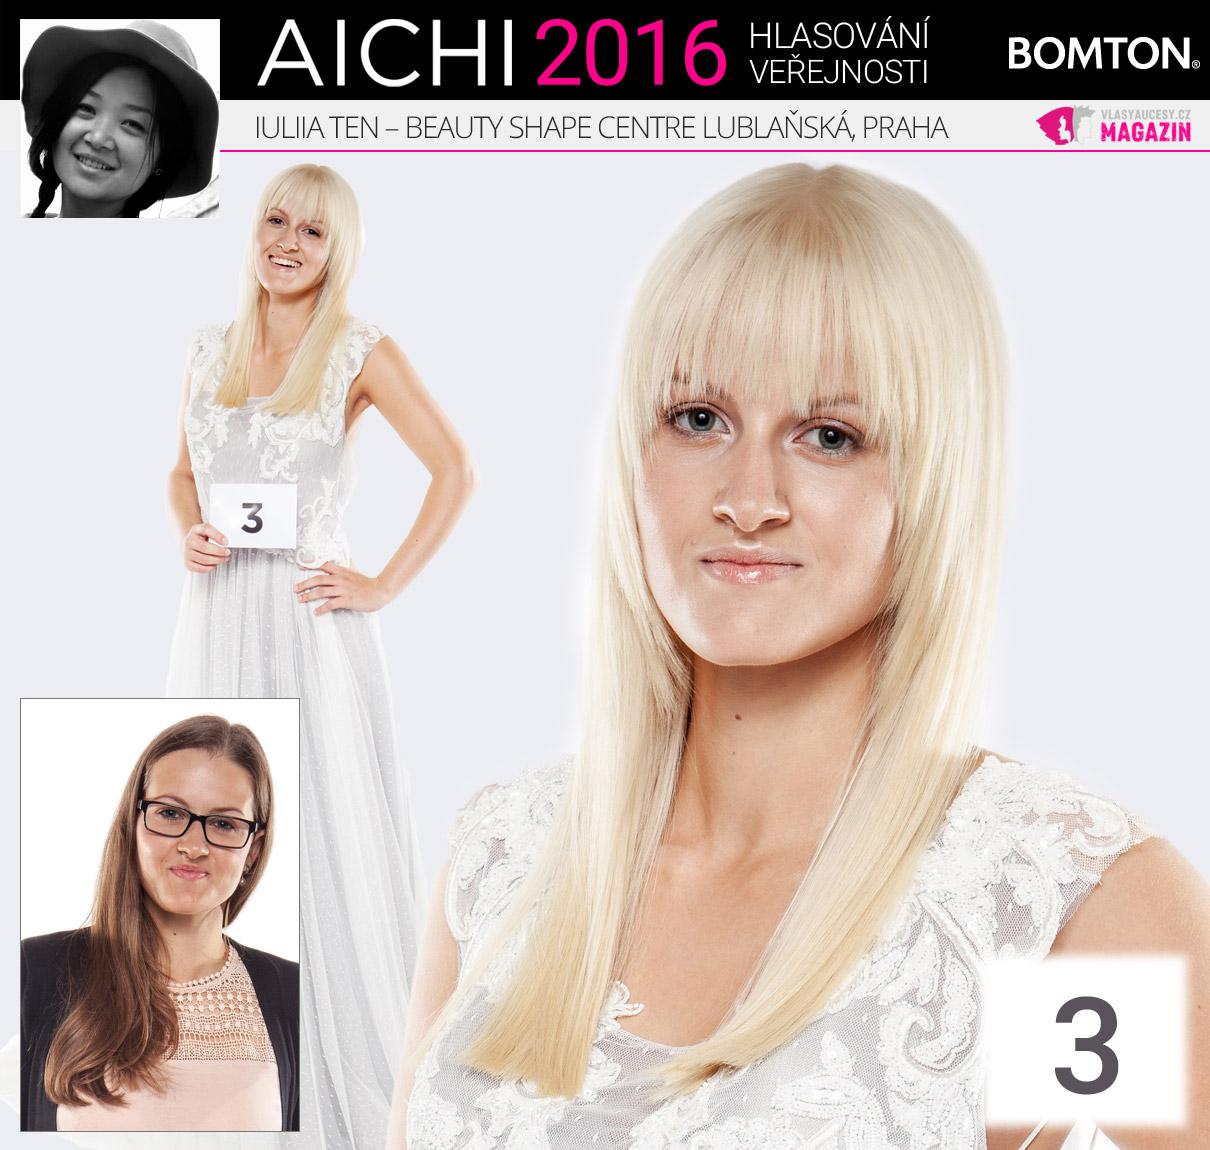 Finálová proměna AICHI 2016: Iuliia Ten, Beauty Shape Centre, Praha